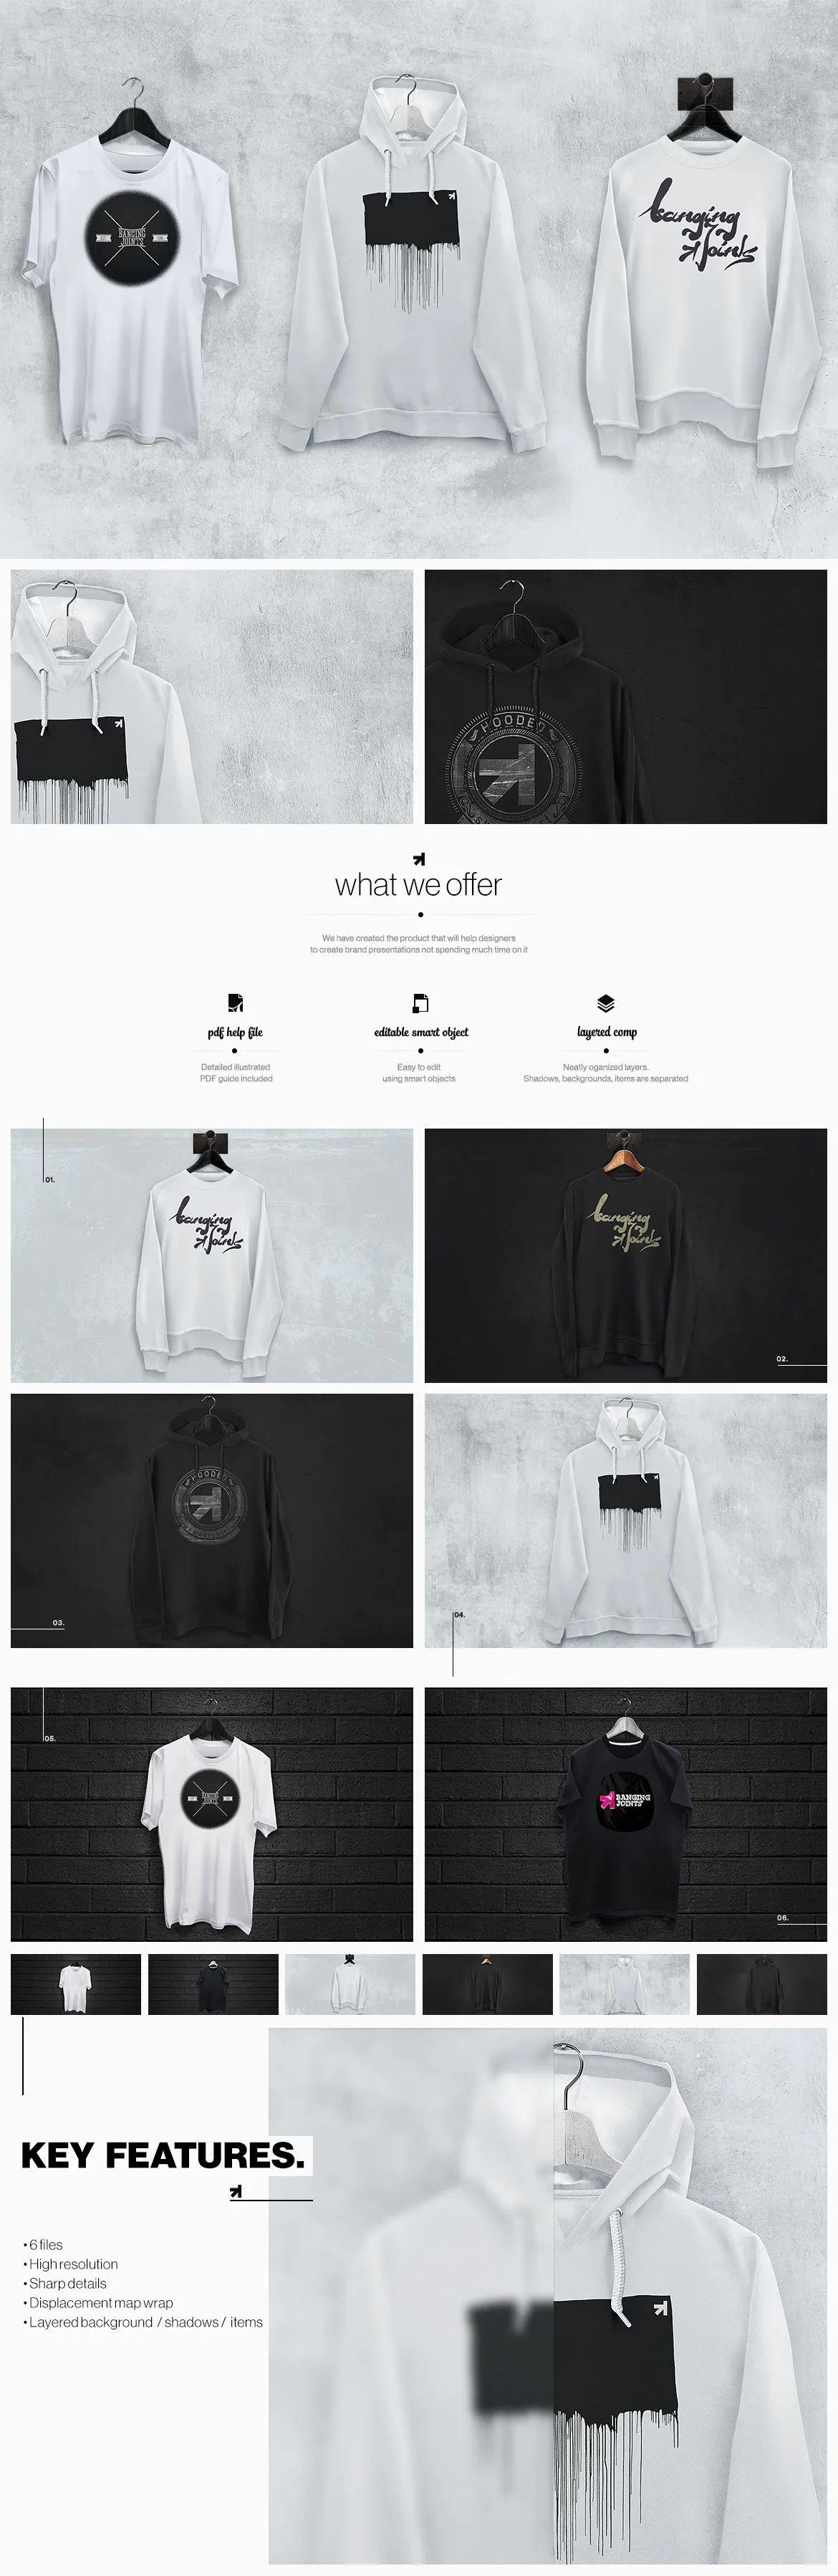 Download T Shirt Sweatshirt Hoodie Mockup Set By Bangingjoints On Envato Elements Hoodie Mockup Sweatshirt Shirt Sweatshirts